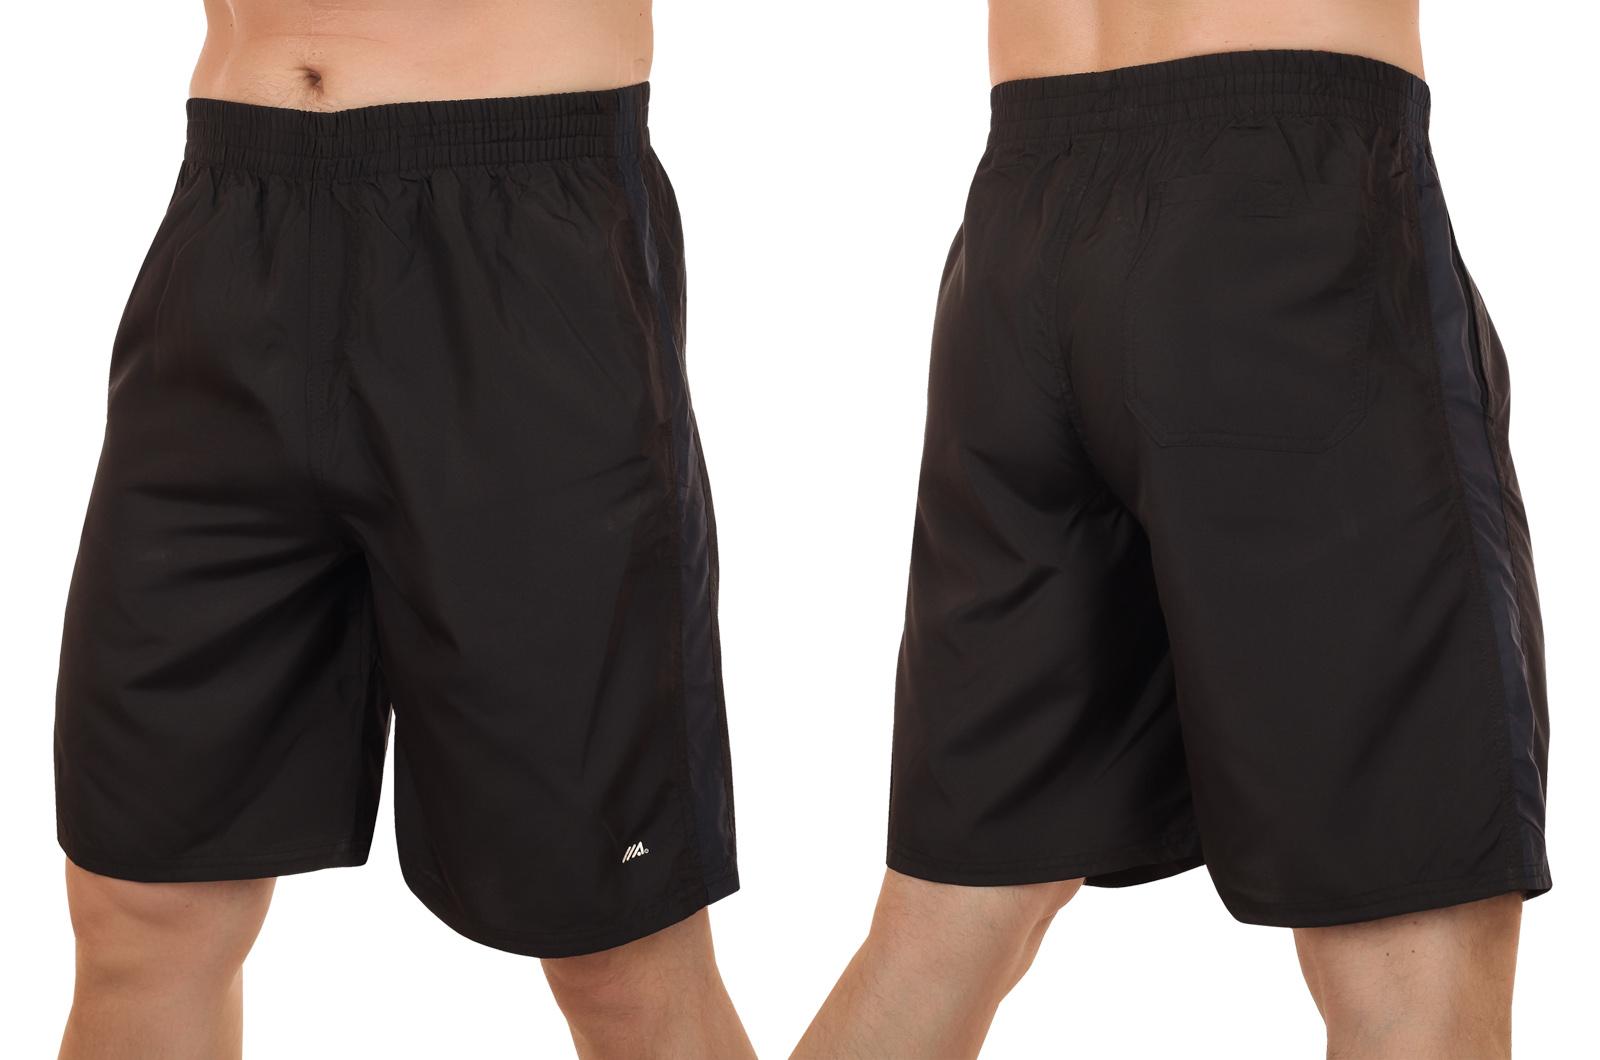 Заказать пацанские шорты на лето от MACE (Канада)